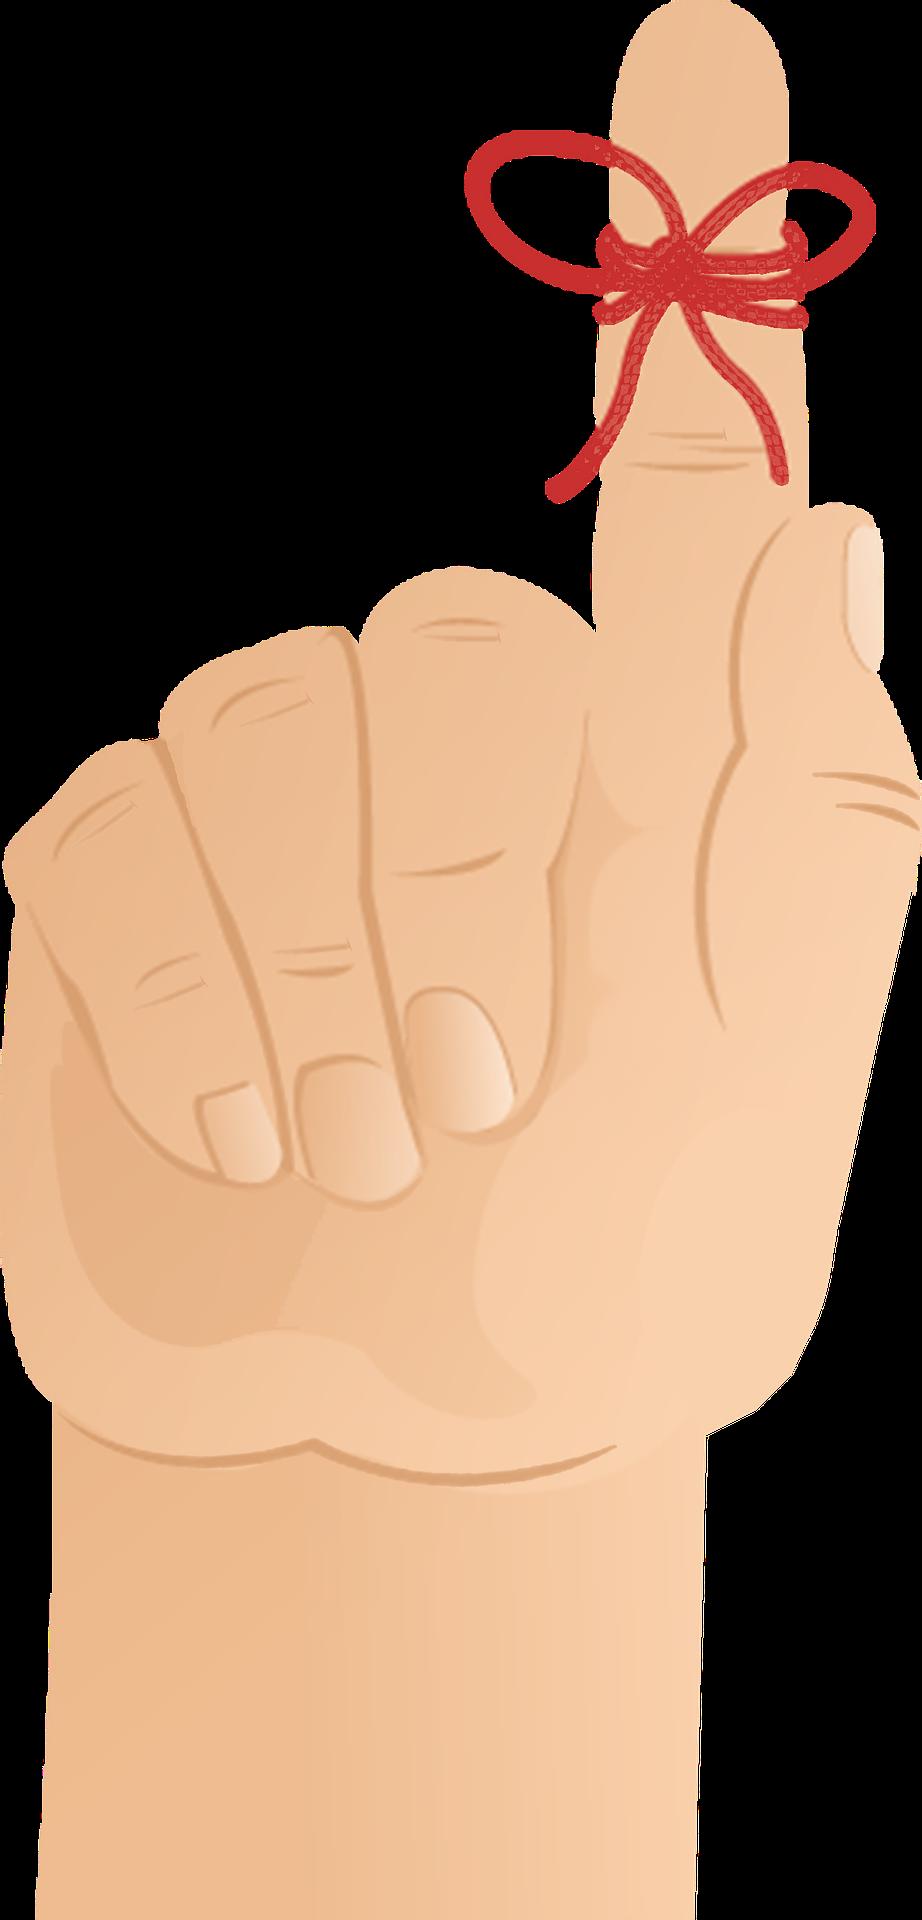 Index of wp content. Finger clipart reminder